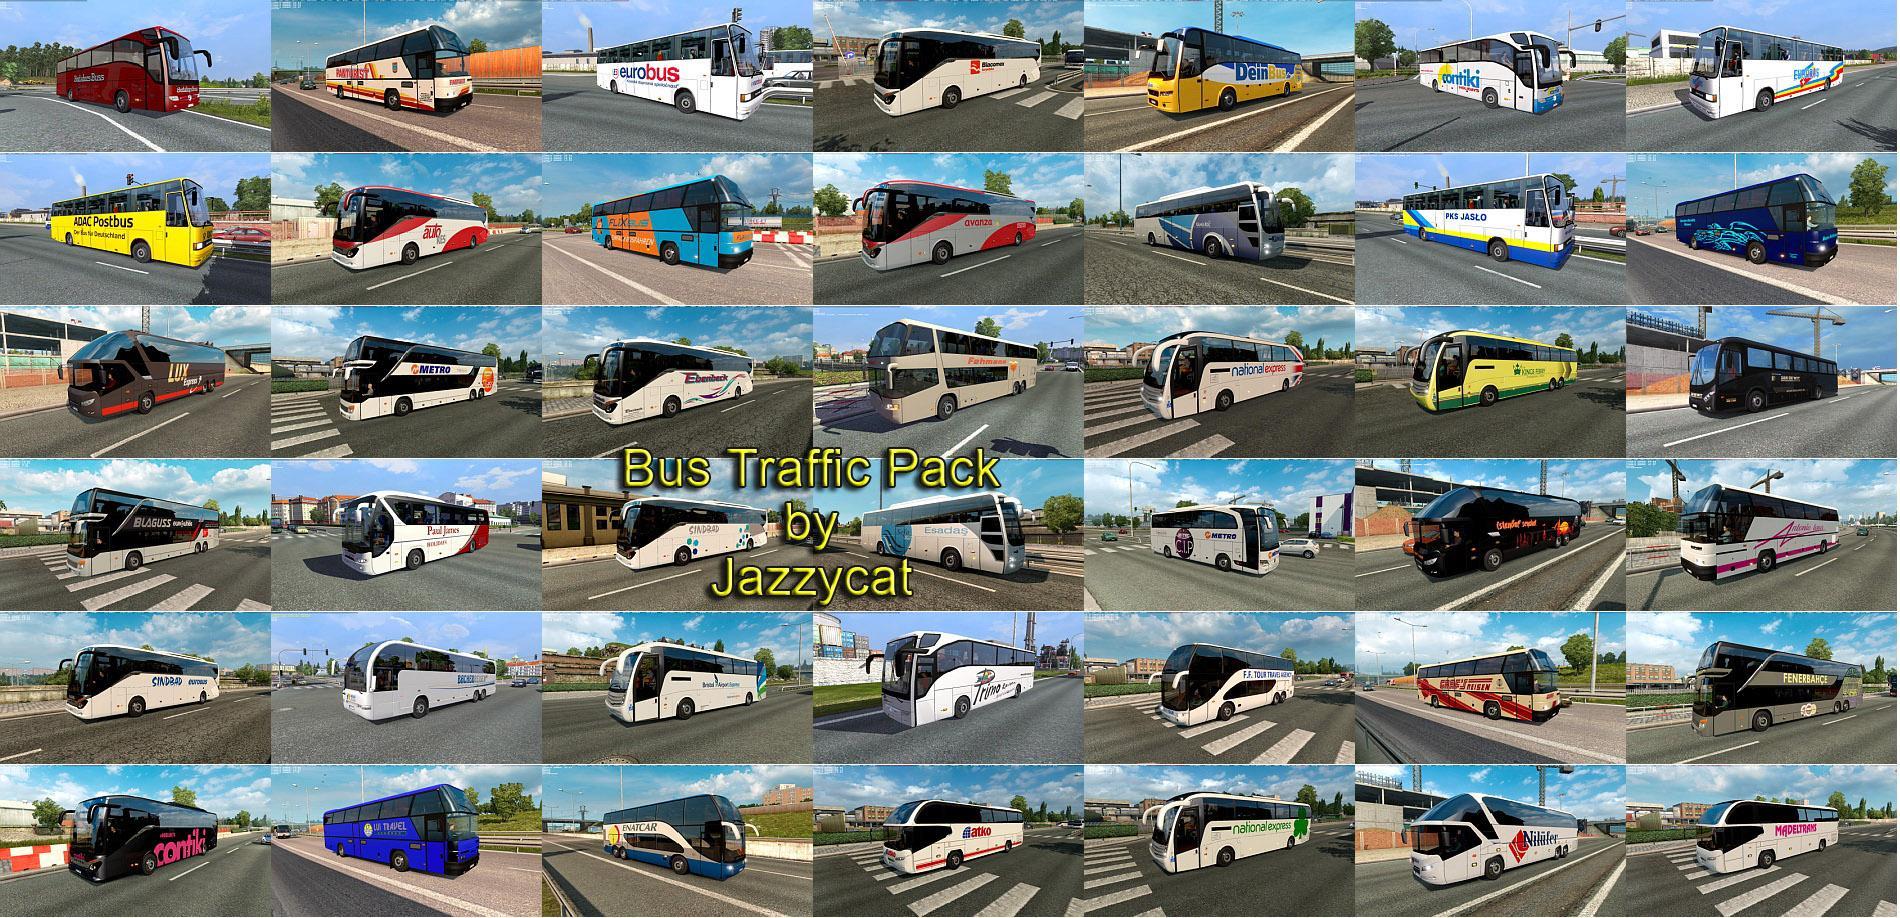 BUS TRAFFIC PACK BY JAZZYCAT v 7 6 | Allmods net